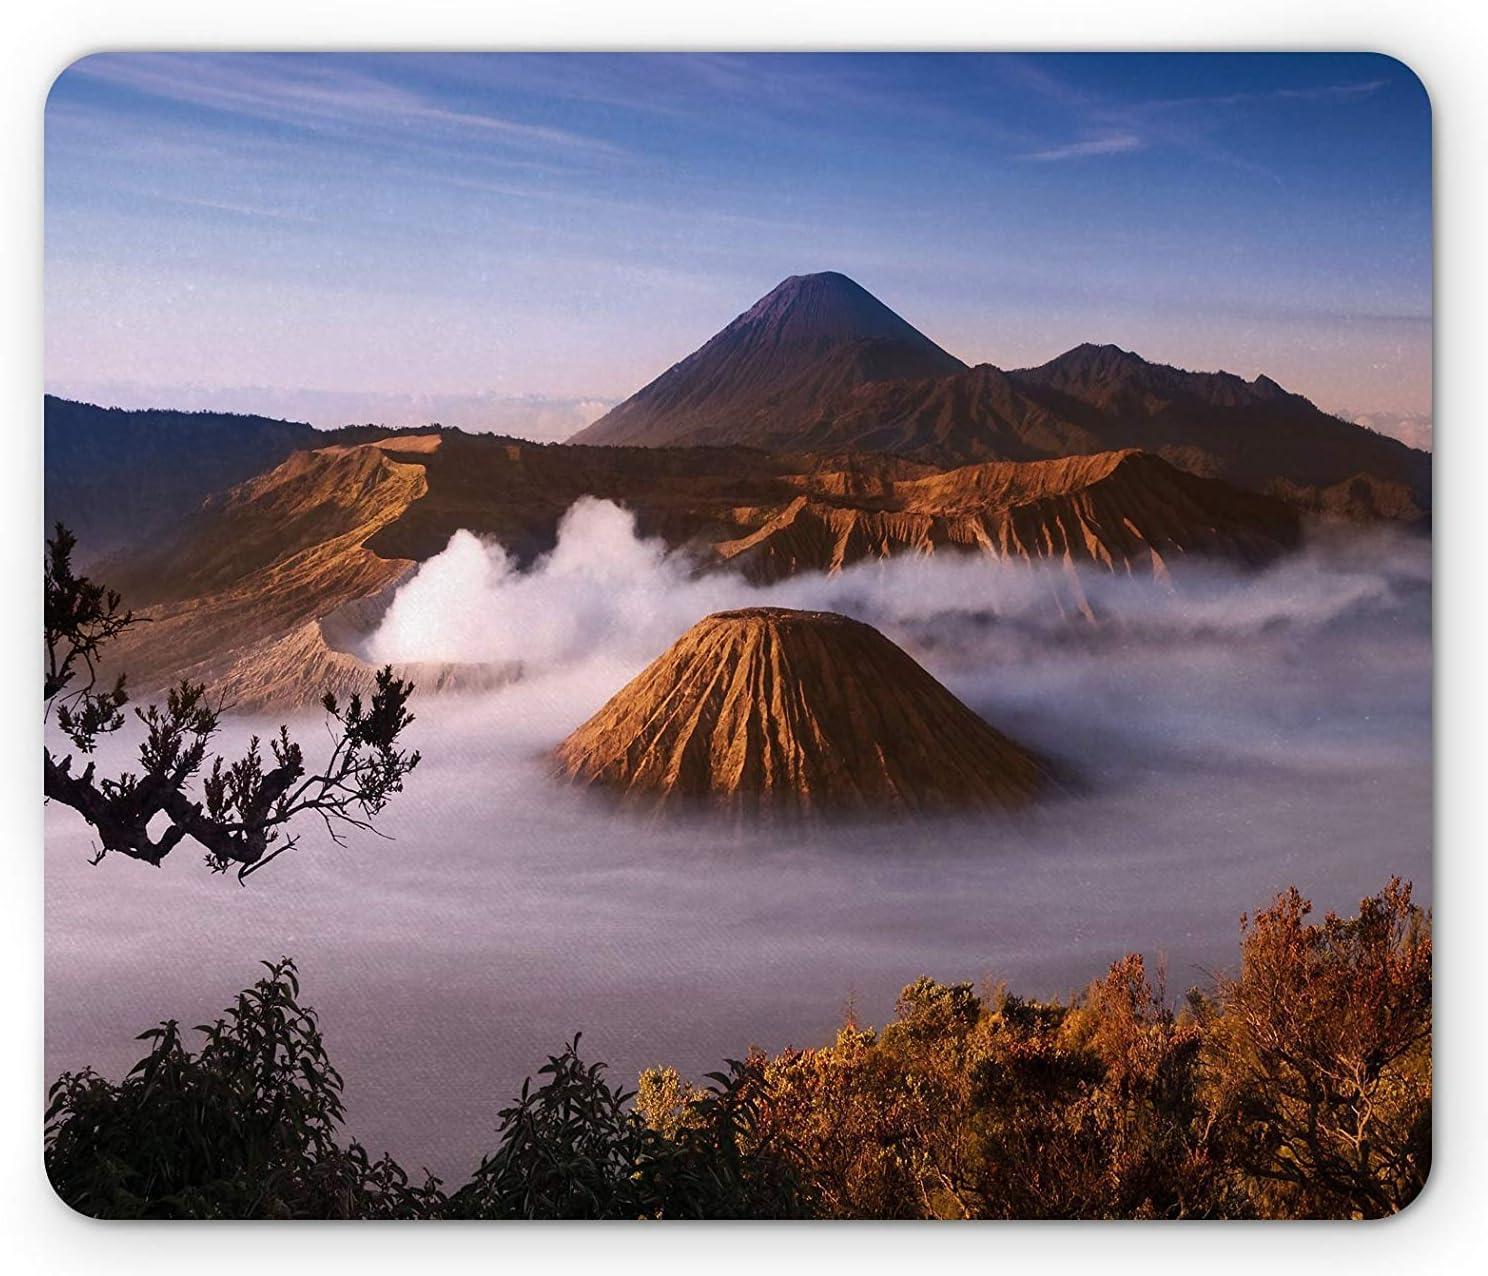 Volcano Mouse Pad, Mount Bromo Volcanoes Taken in Tengger Caldera East Java Indonesia, Standard Size Rectangle Non-Slip Rubber Mousepad, Light Caramel Blue White